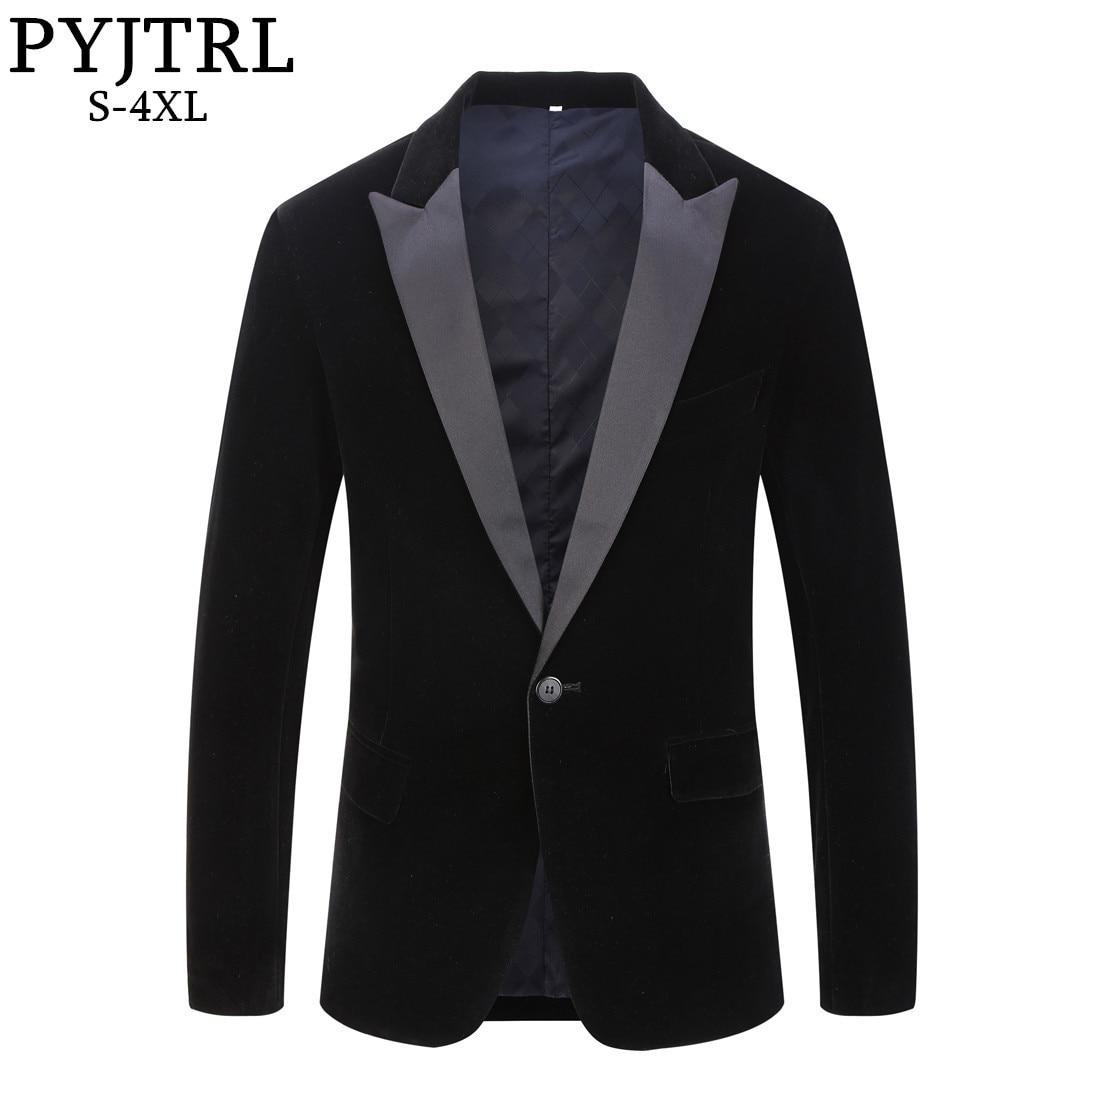 SIMWOOD 2019 Autumn Denim Jacket Men New Fashion Vintage Frayed Jeans Jackets Slim Fit Coats Outerwear